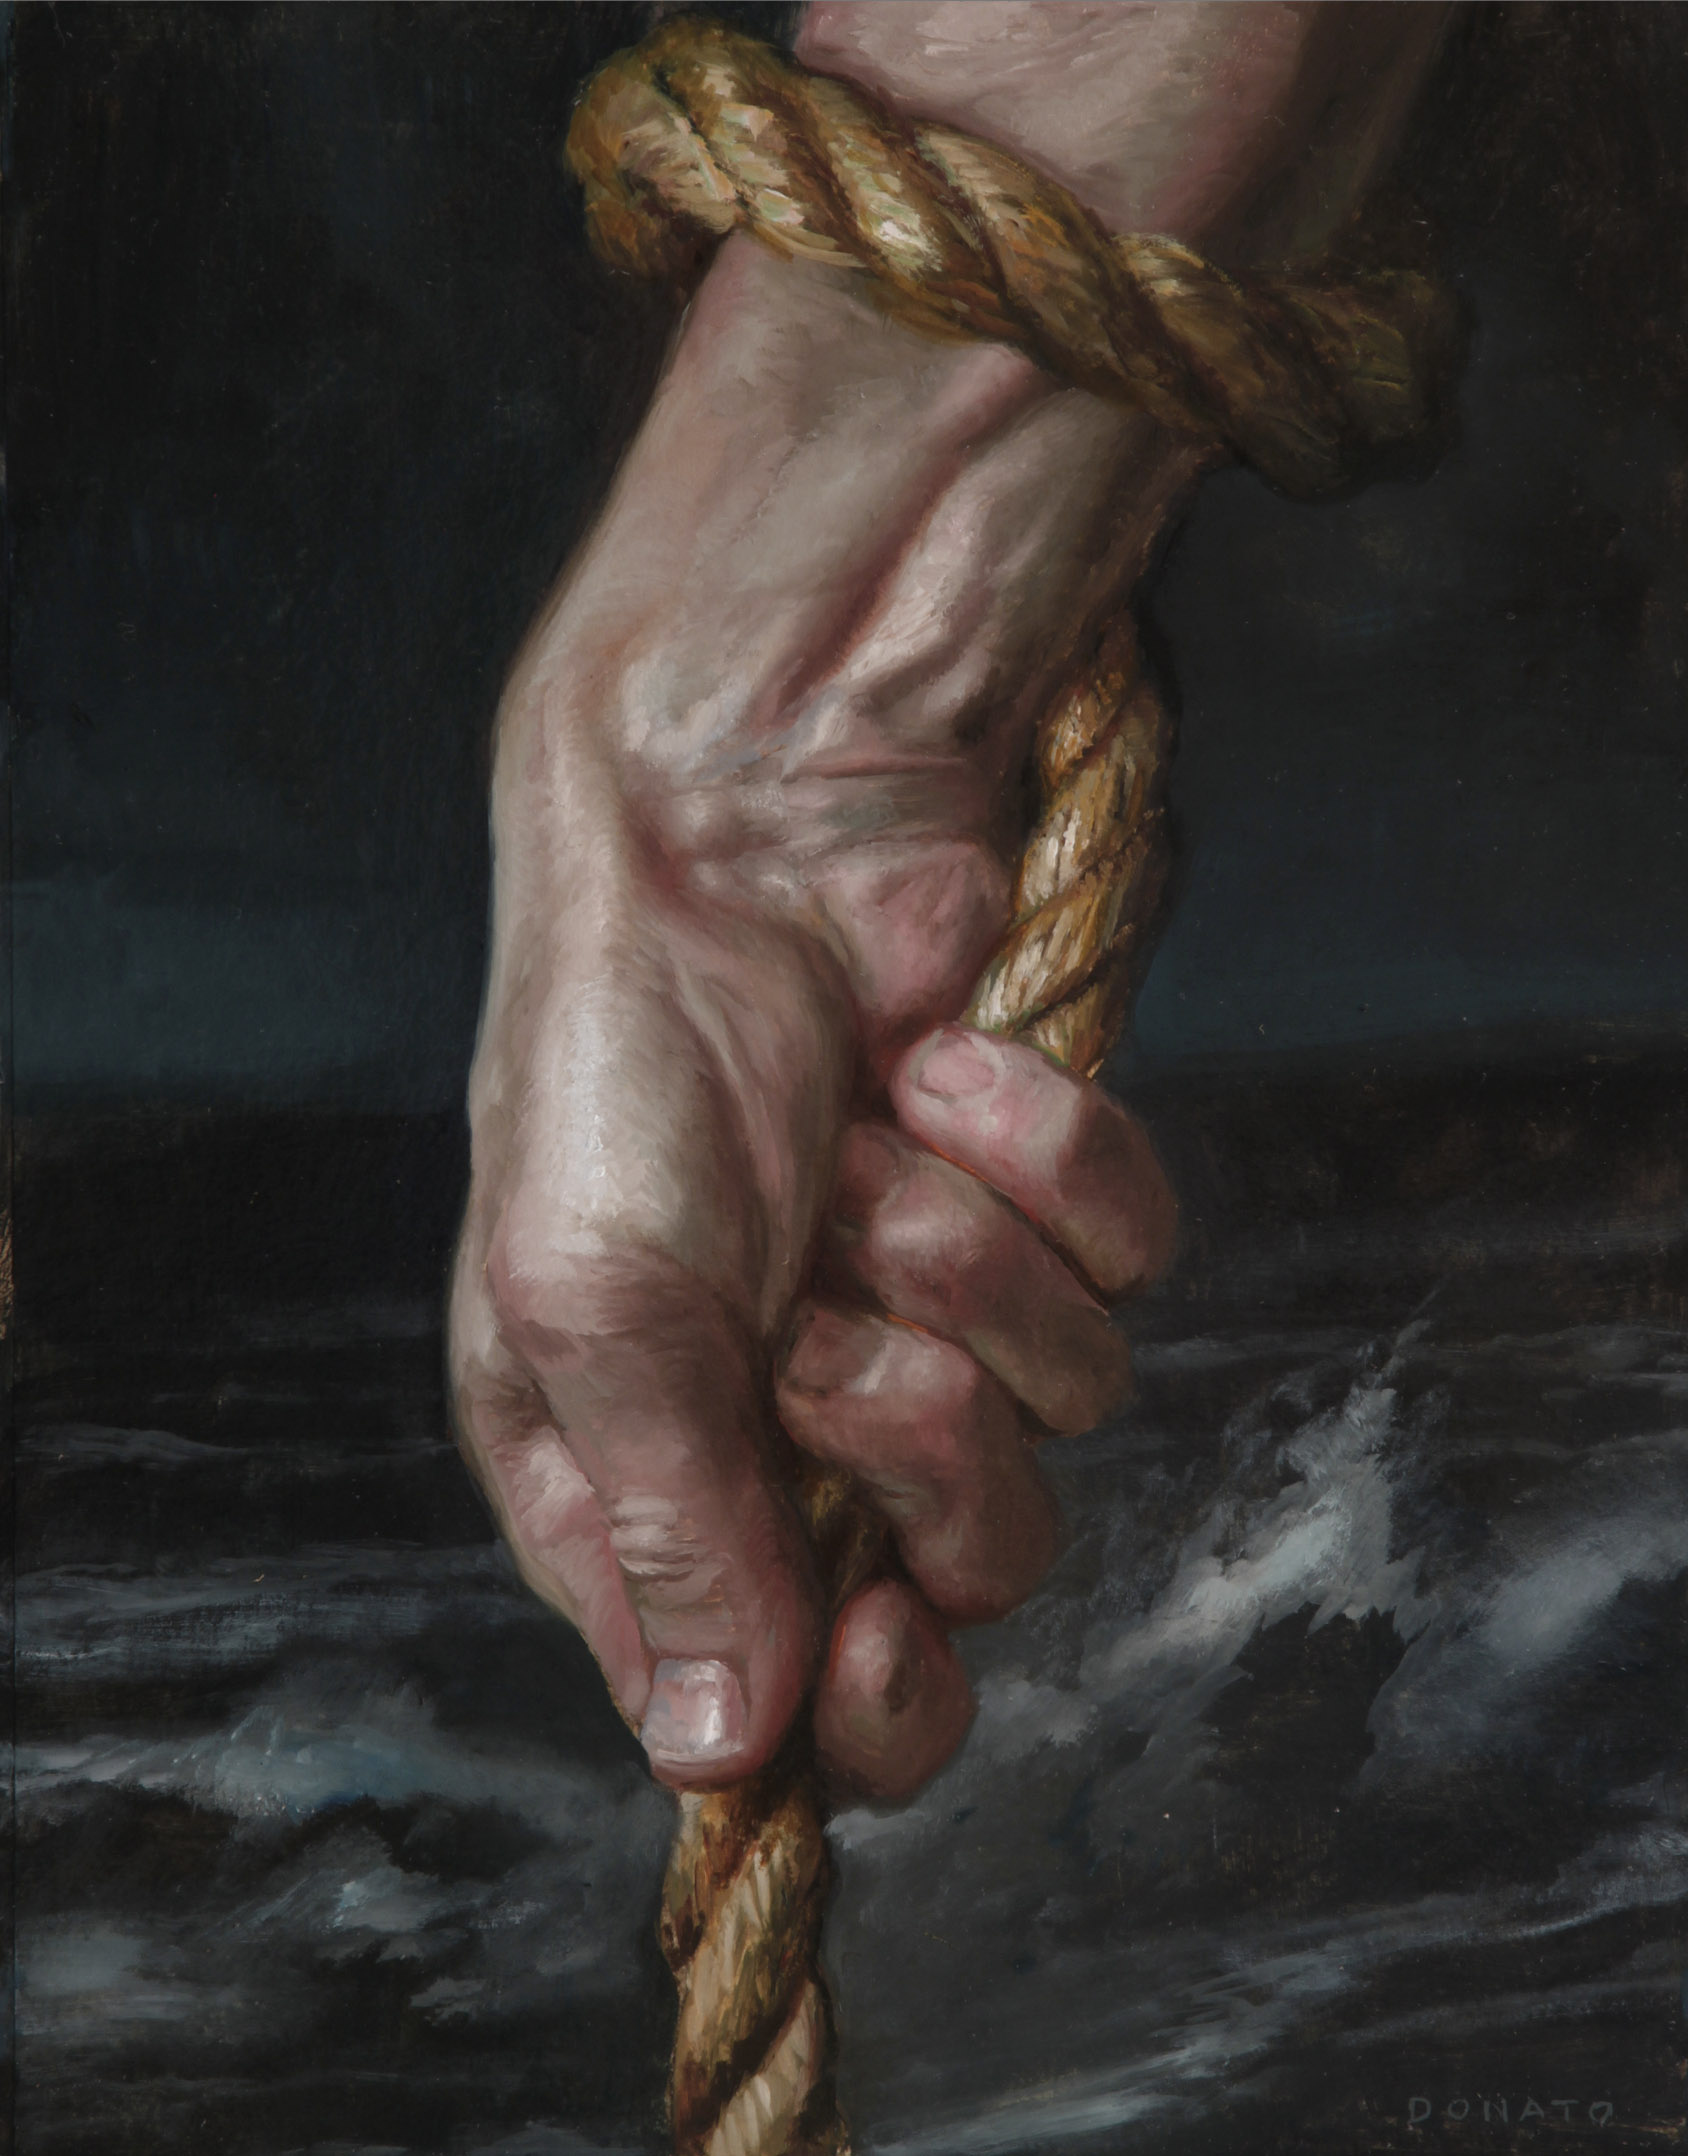 https://0201.nccdn.net/1_2/000/000/180/da3/Burdens-rope-Donato-1688x2156.jpg